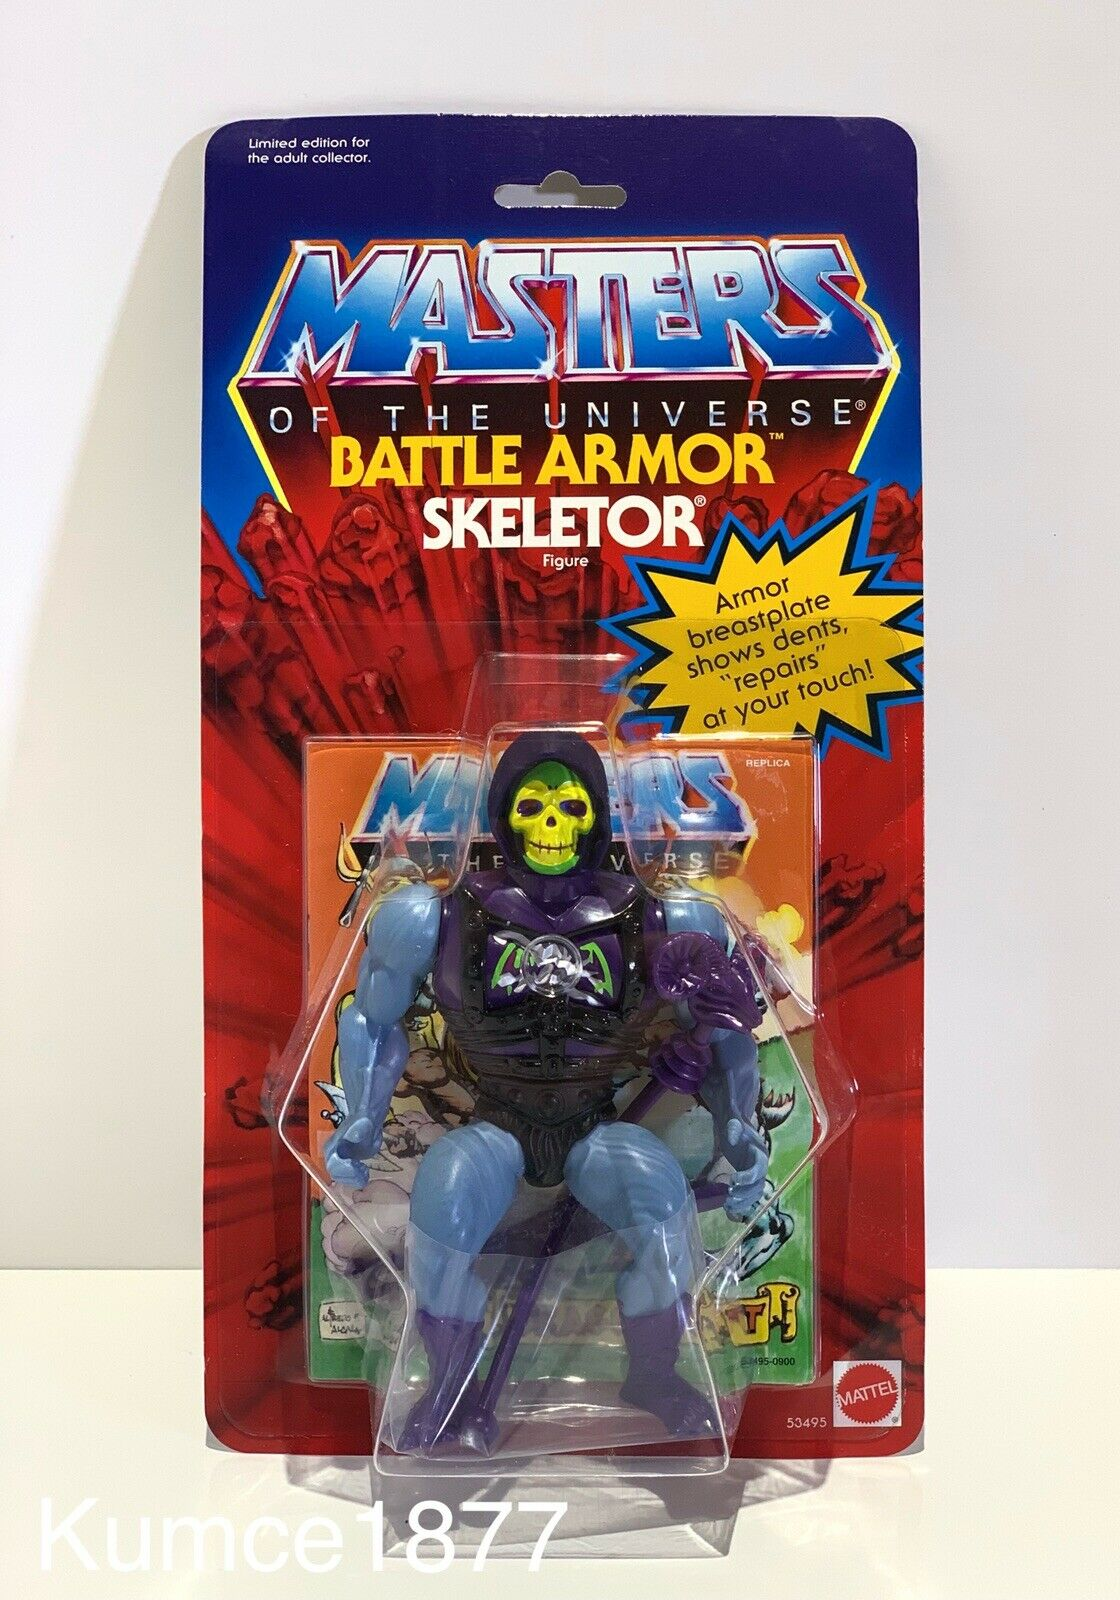 MOTU, Commemorative Battle Armor Skeletor, Masters of the Universe, MISB, MOC